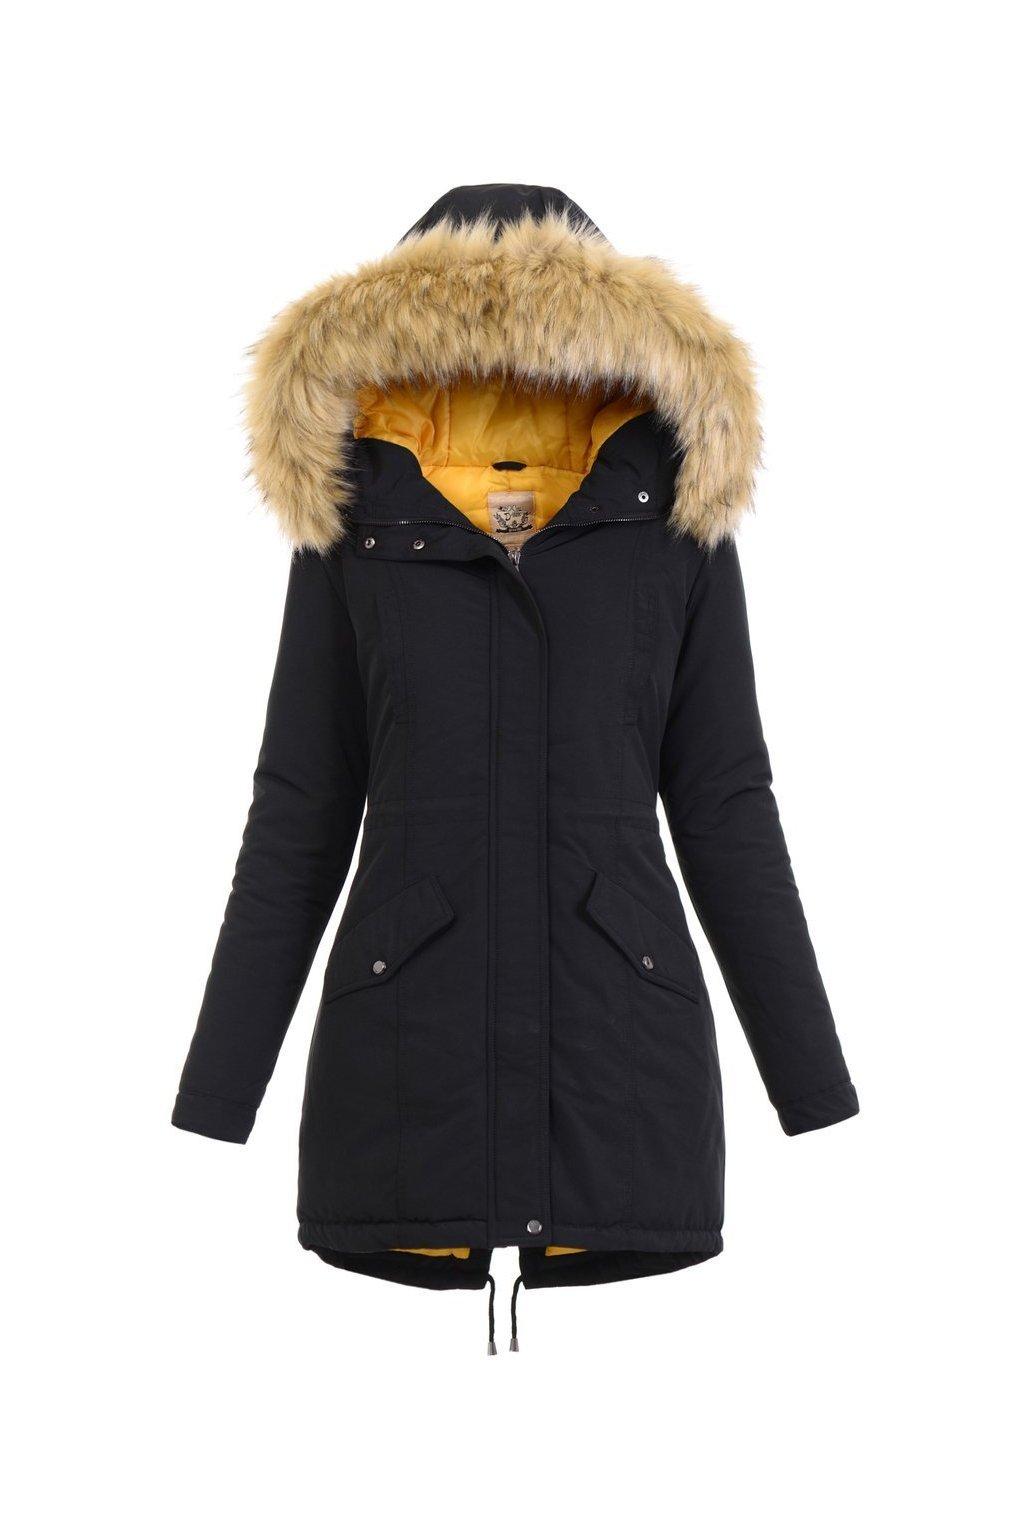 Dámska zimná bunda parka s kapucňou 4791 čiernožltá